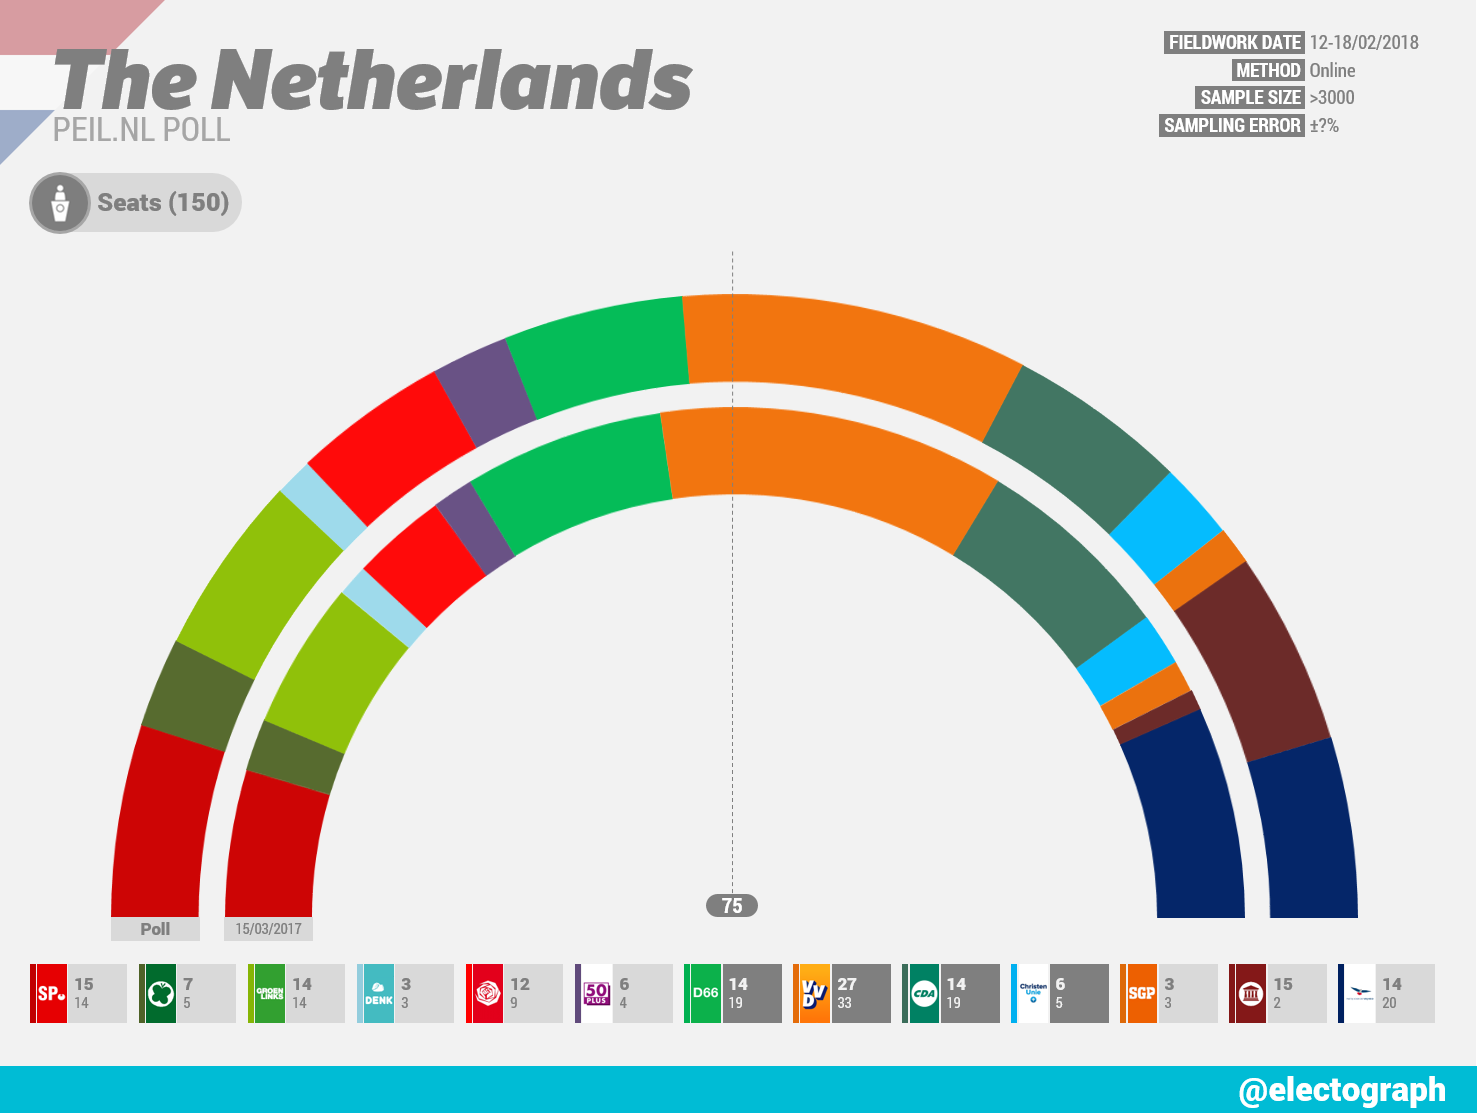 THE NETHERLANDS Peil.nl poll chart, February 2018